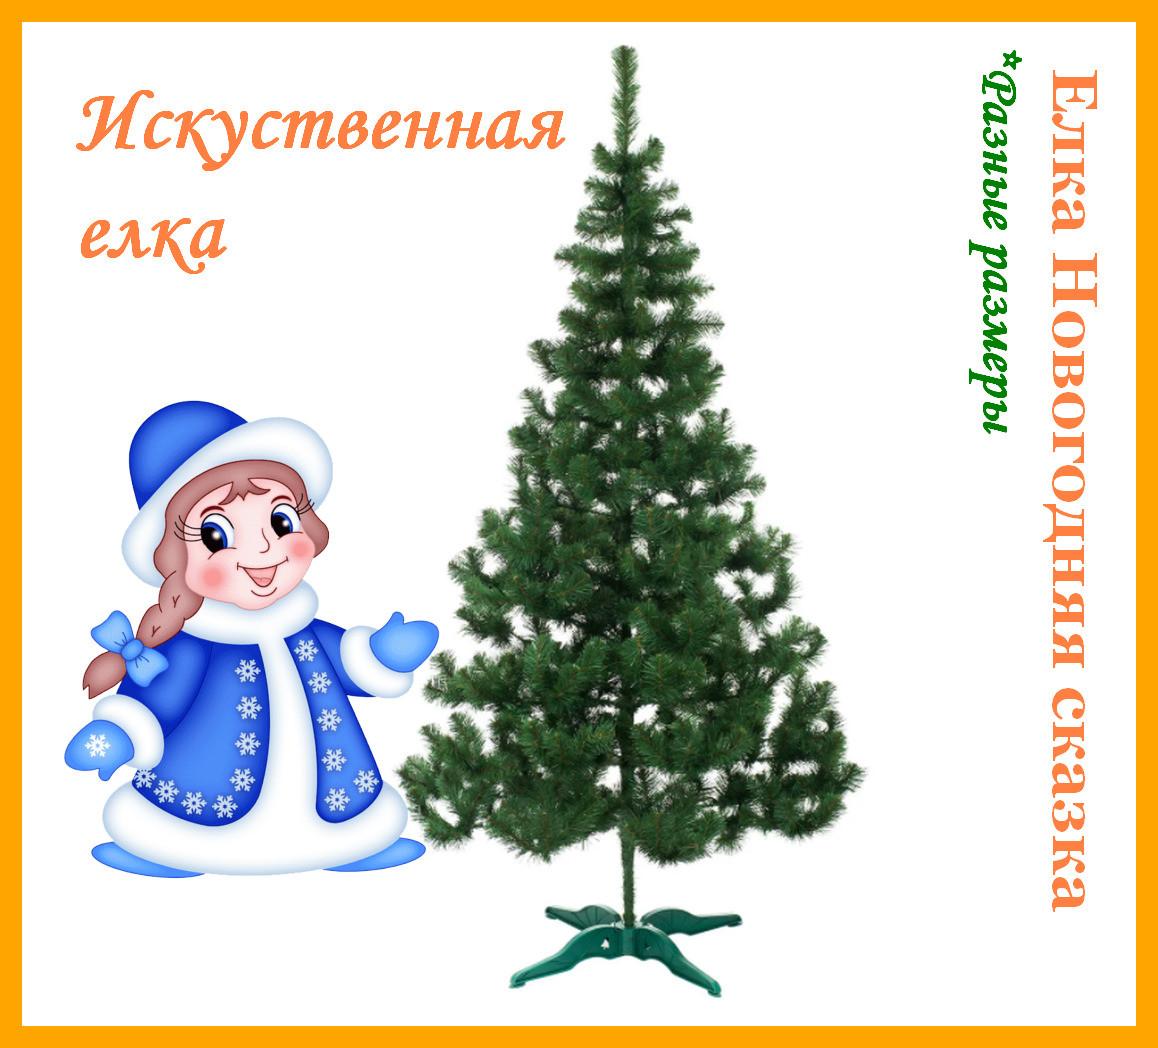 Штучна ЯЛИНКА новорічна КАЗКА 1.3 метра. ЕЛЬ штучне КАЗКА ПВХ 1,3 м. новорічна Ялинка